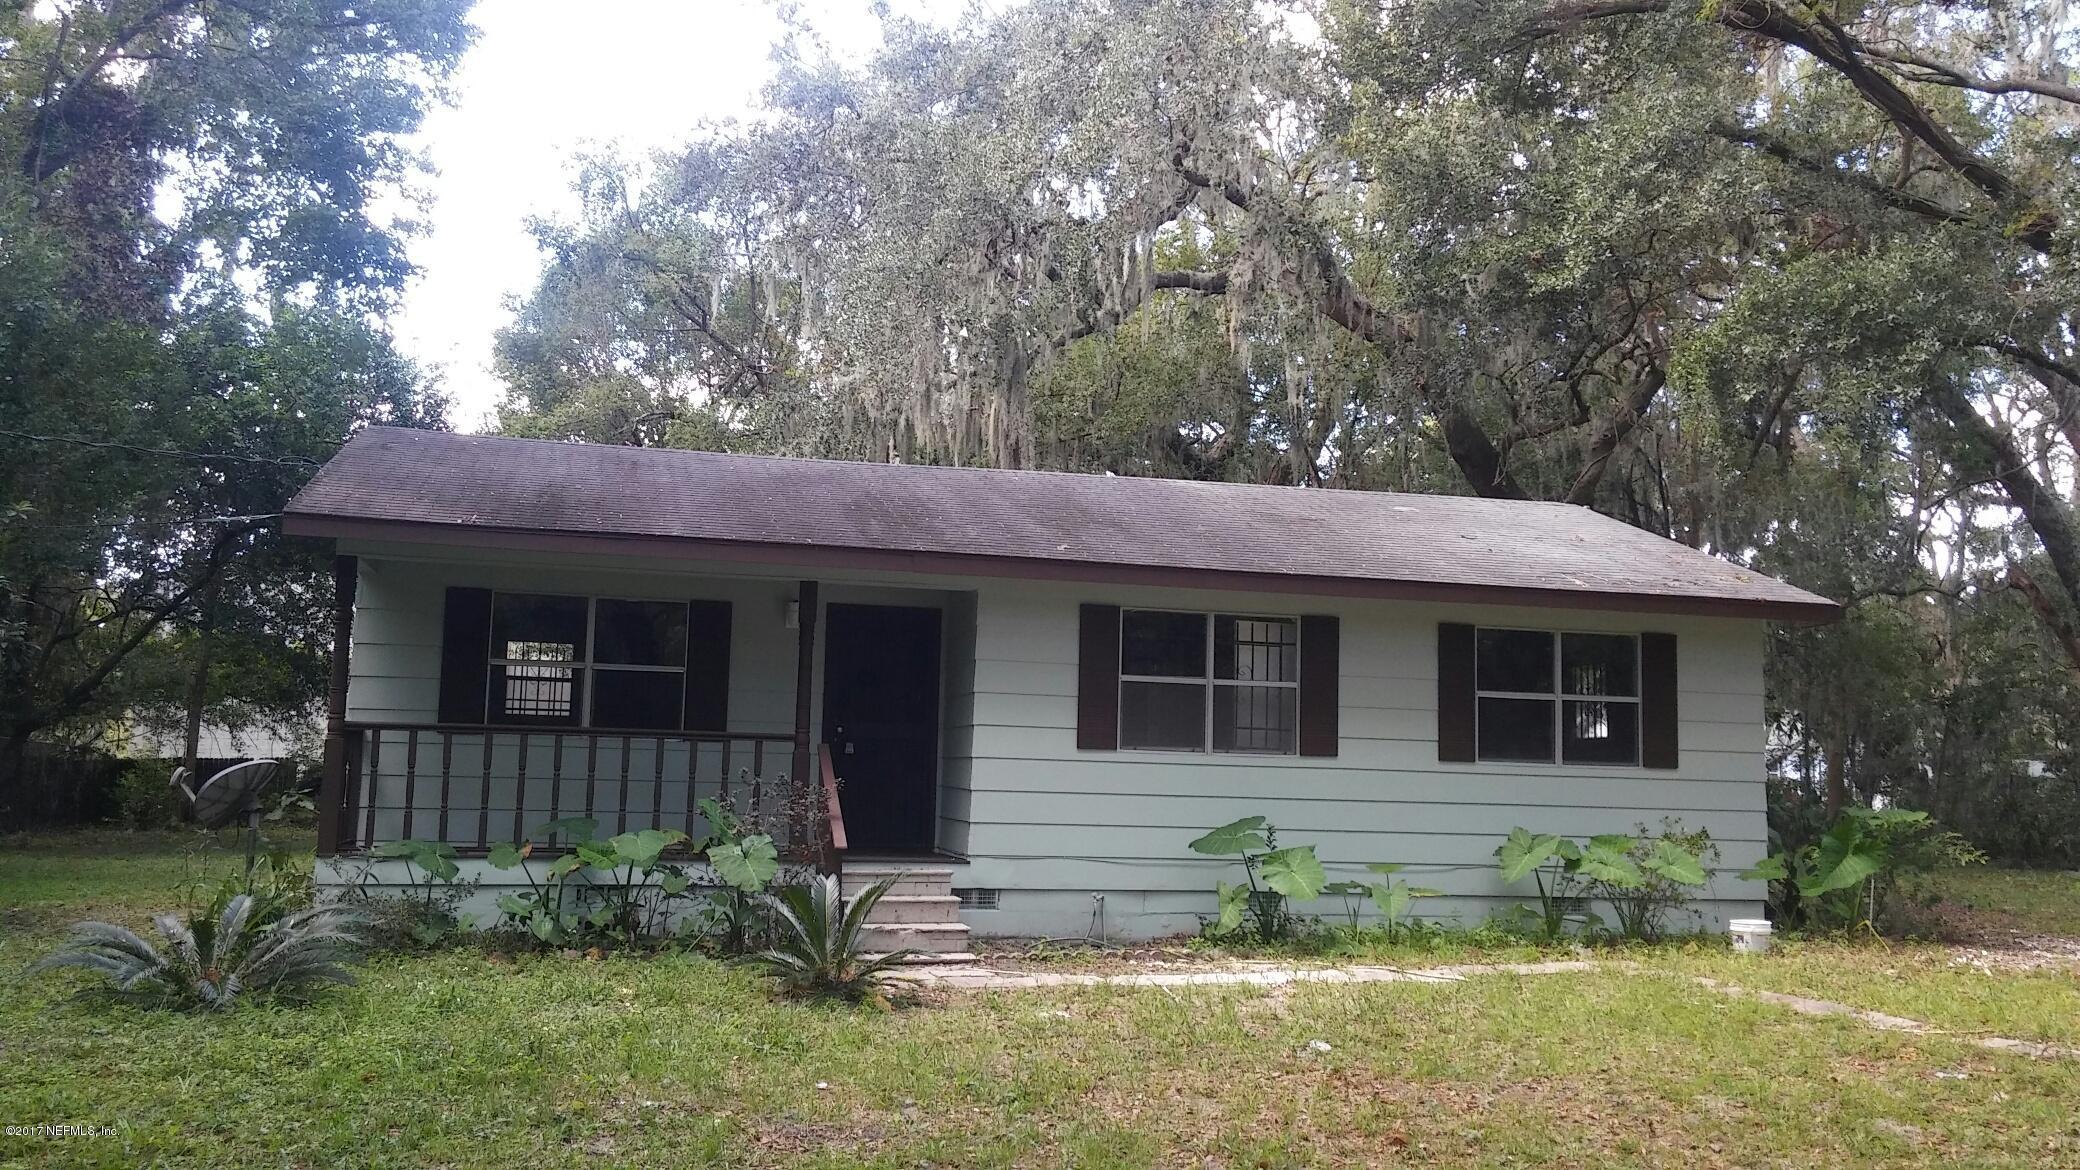 Photo of 1636 ARLETHA, JACKSONVILLE, FL 32207